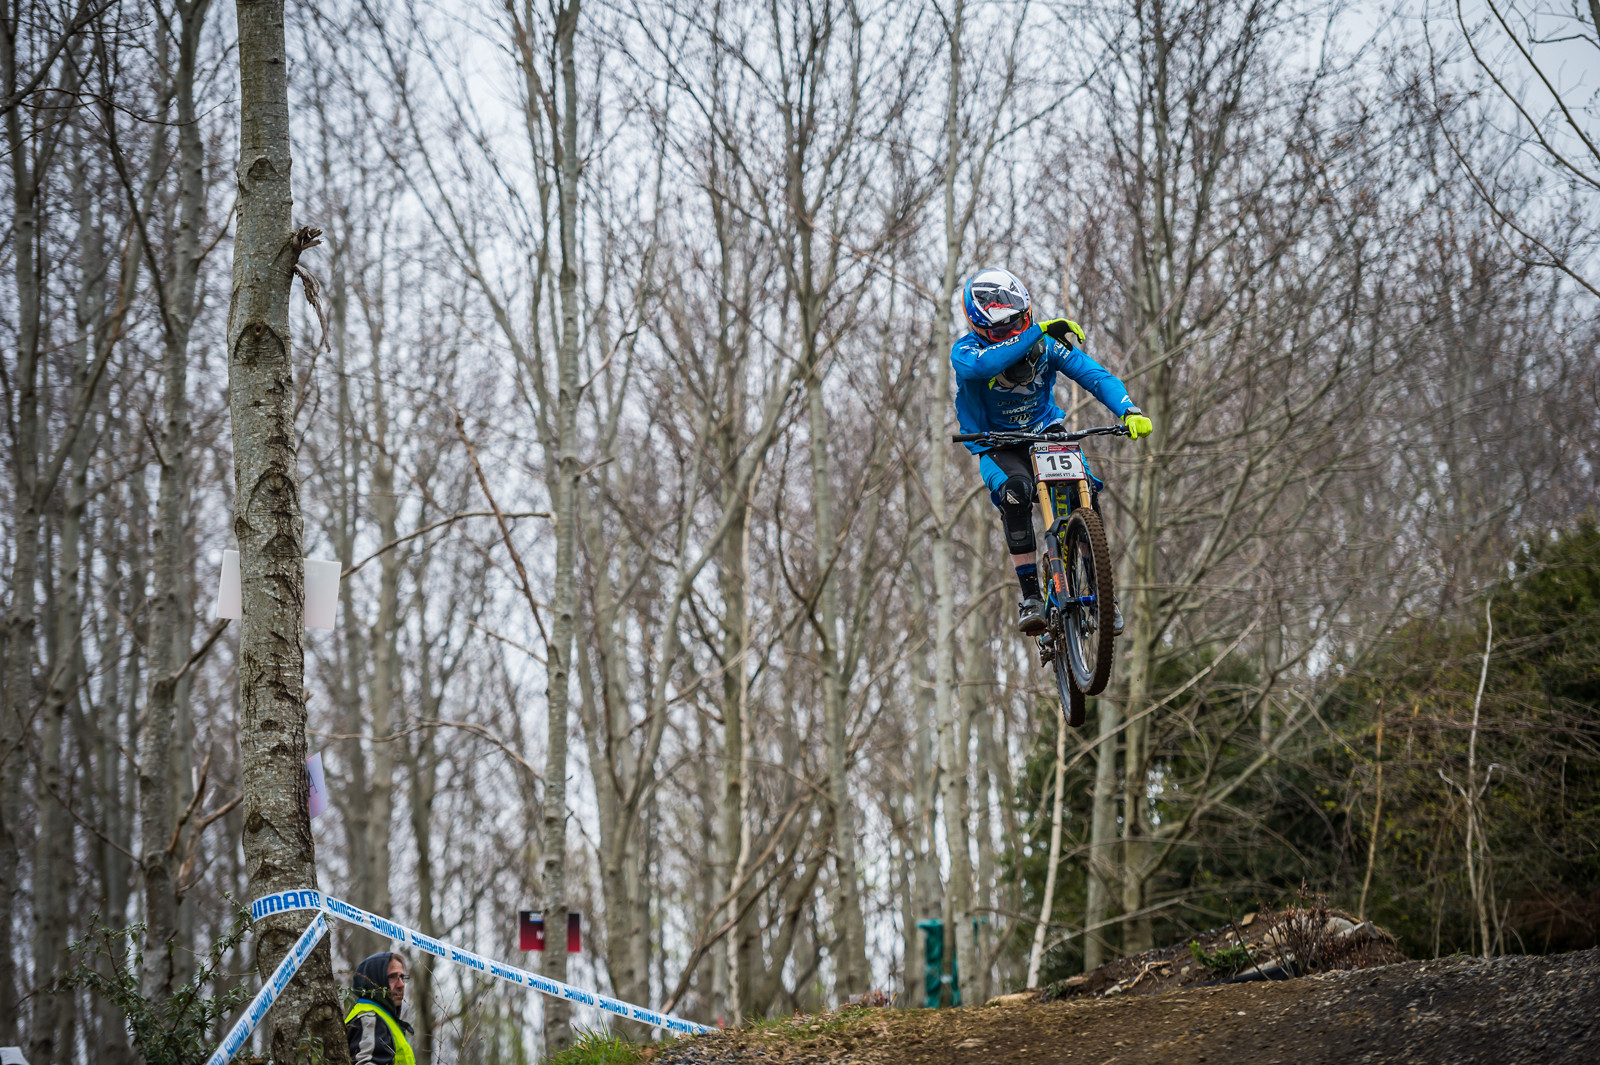 Bernard Kerr dabbing - iceman2058 - Mountain Biking Pictures - Vital MTB